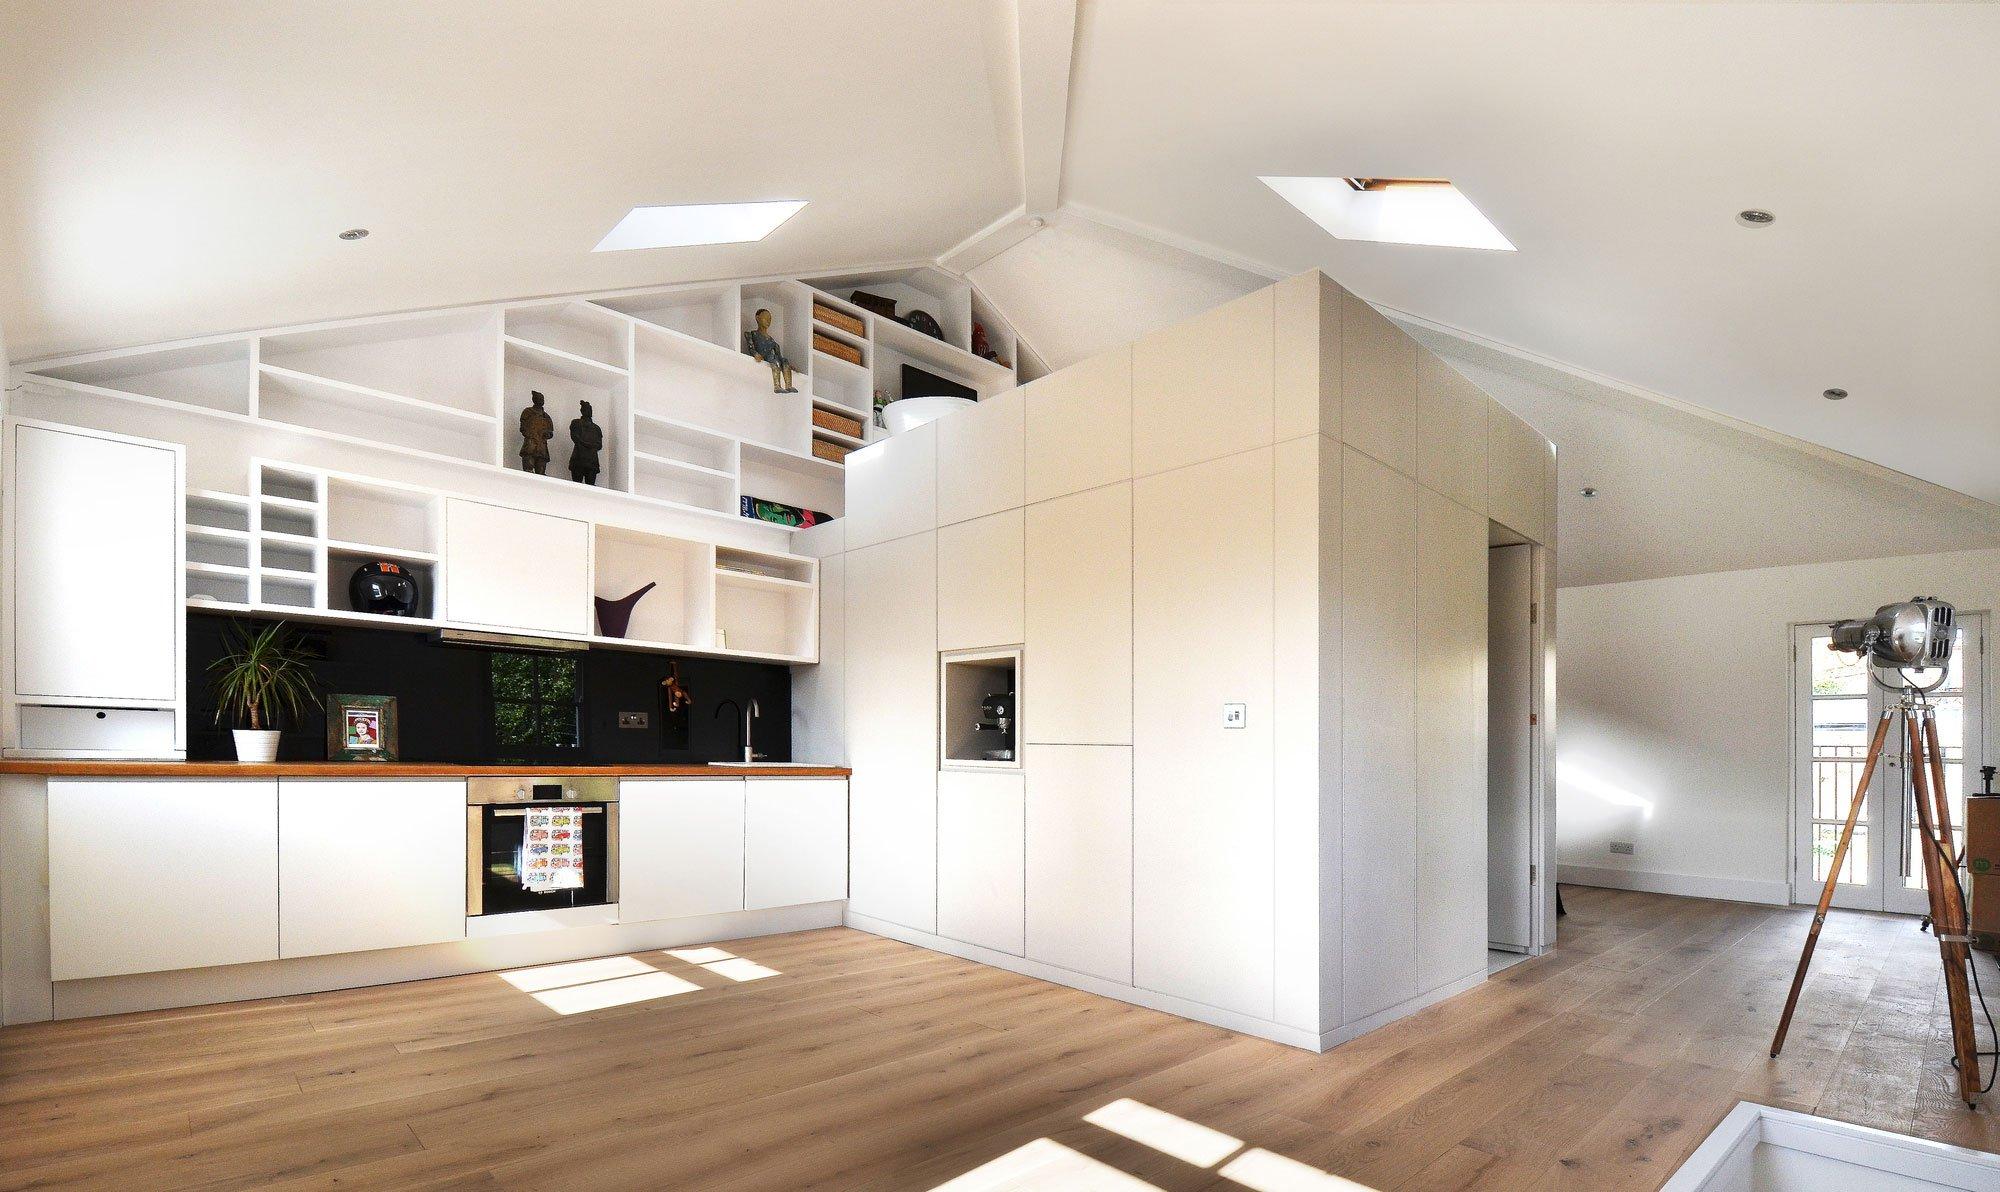 loft-space-in-camden-04